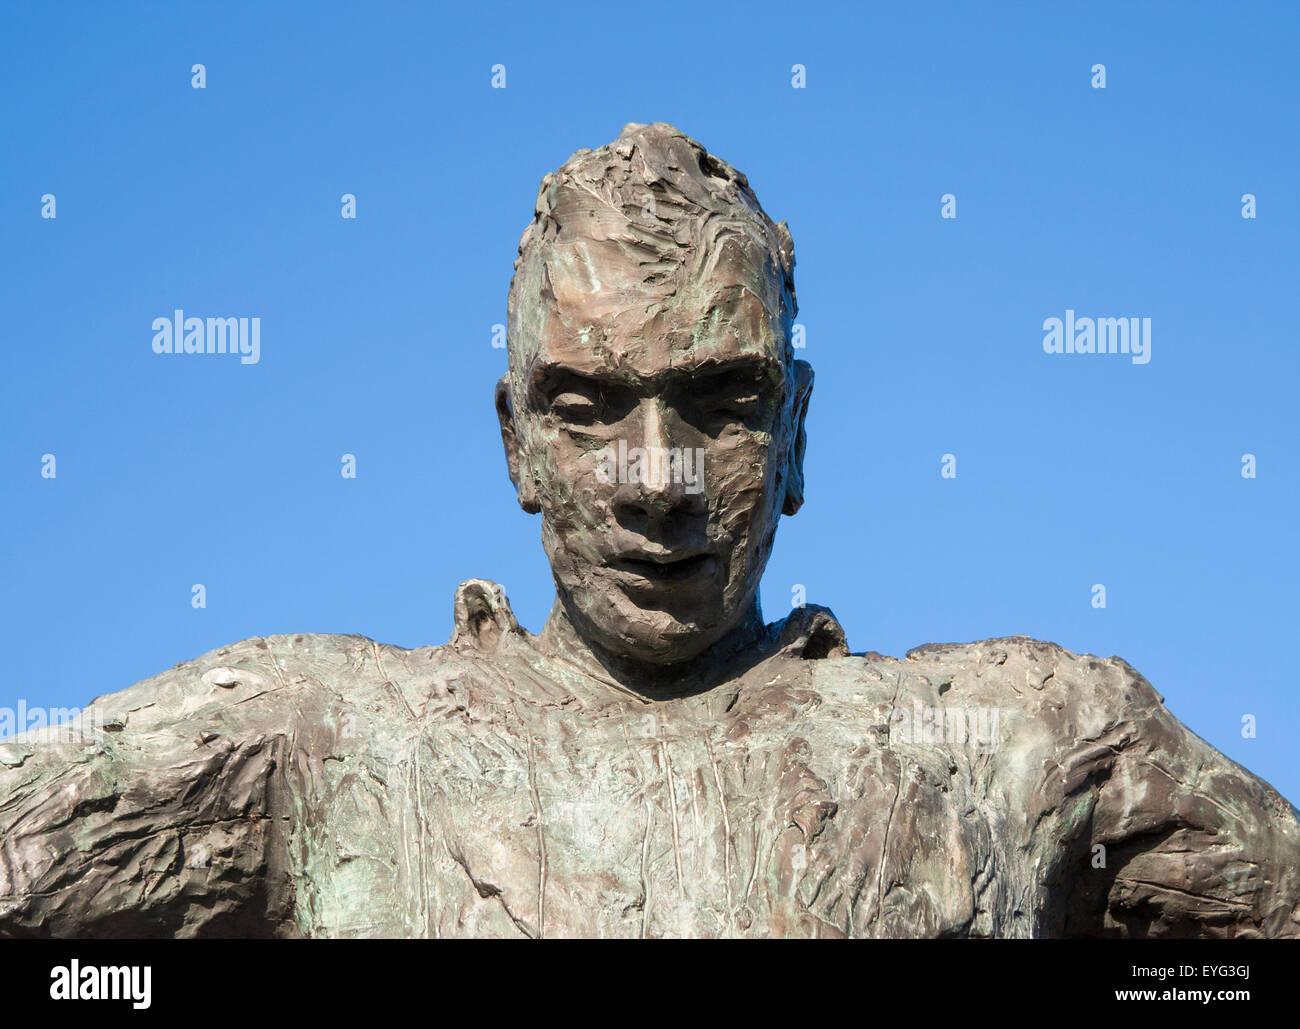 Statue of former Newcastle United footballer, Jackie Milburn. Newcastle upon Tyne, England, UK - Stock Image